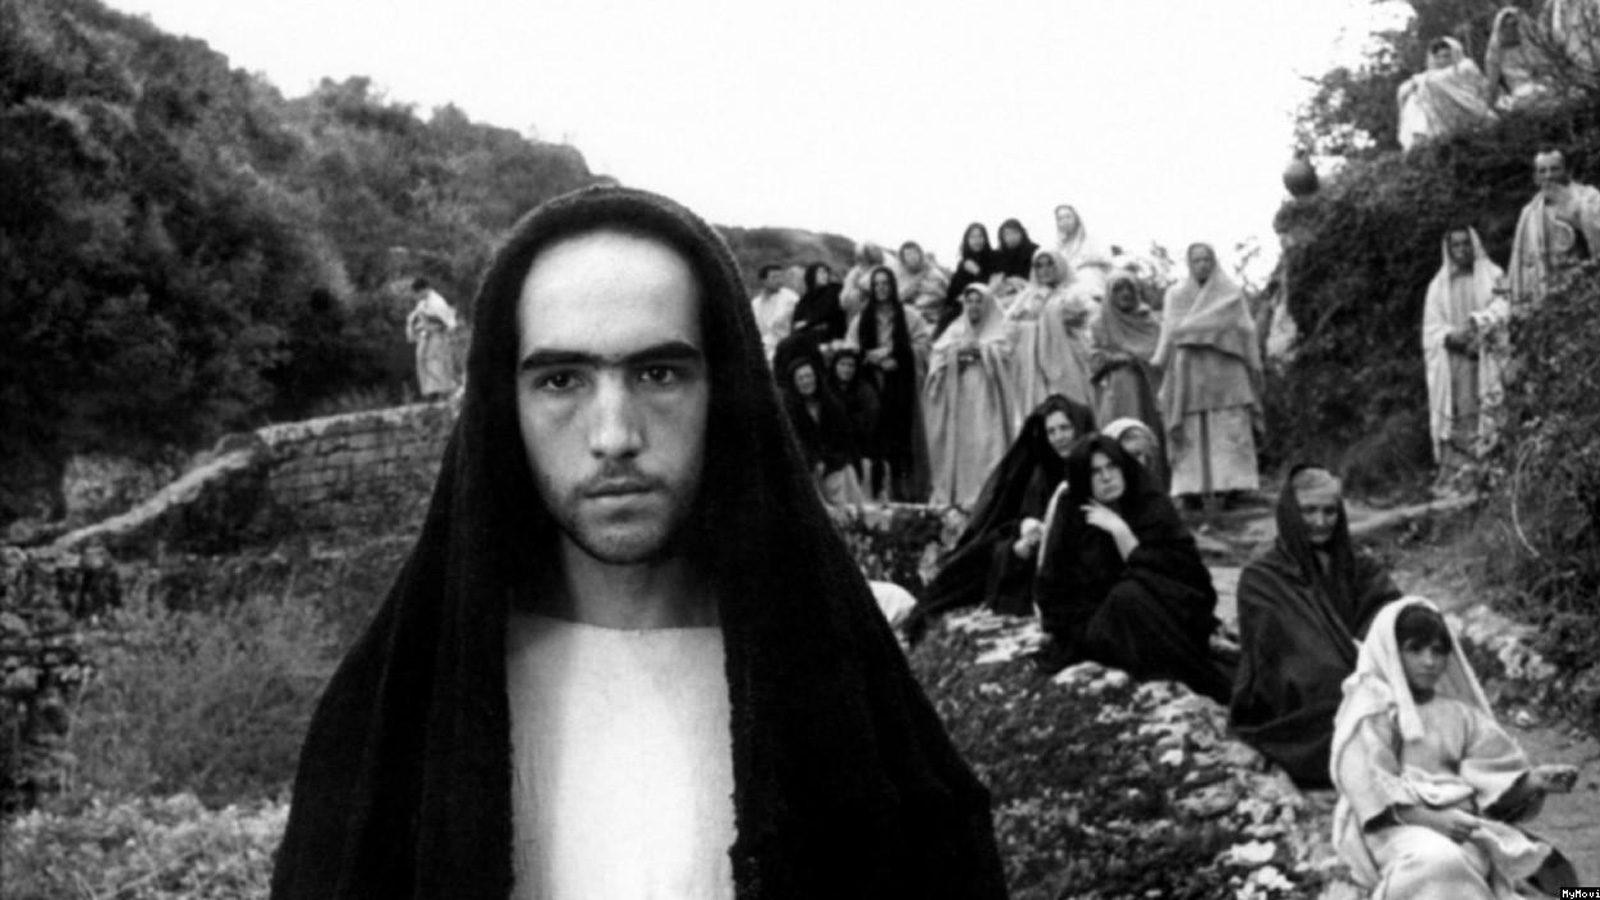 19-year-old Catalan trade unionist  Enrique Irazoqui  cast as Jesus in  Il Vangelo Secondo Matteo